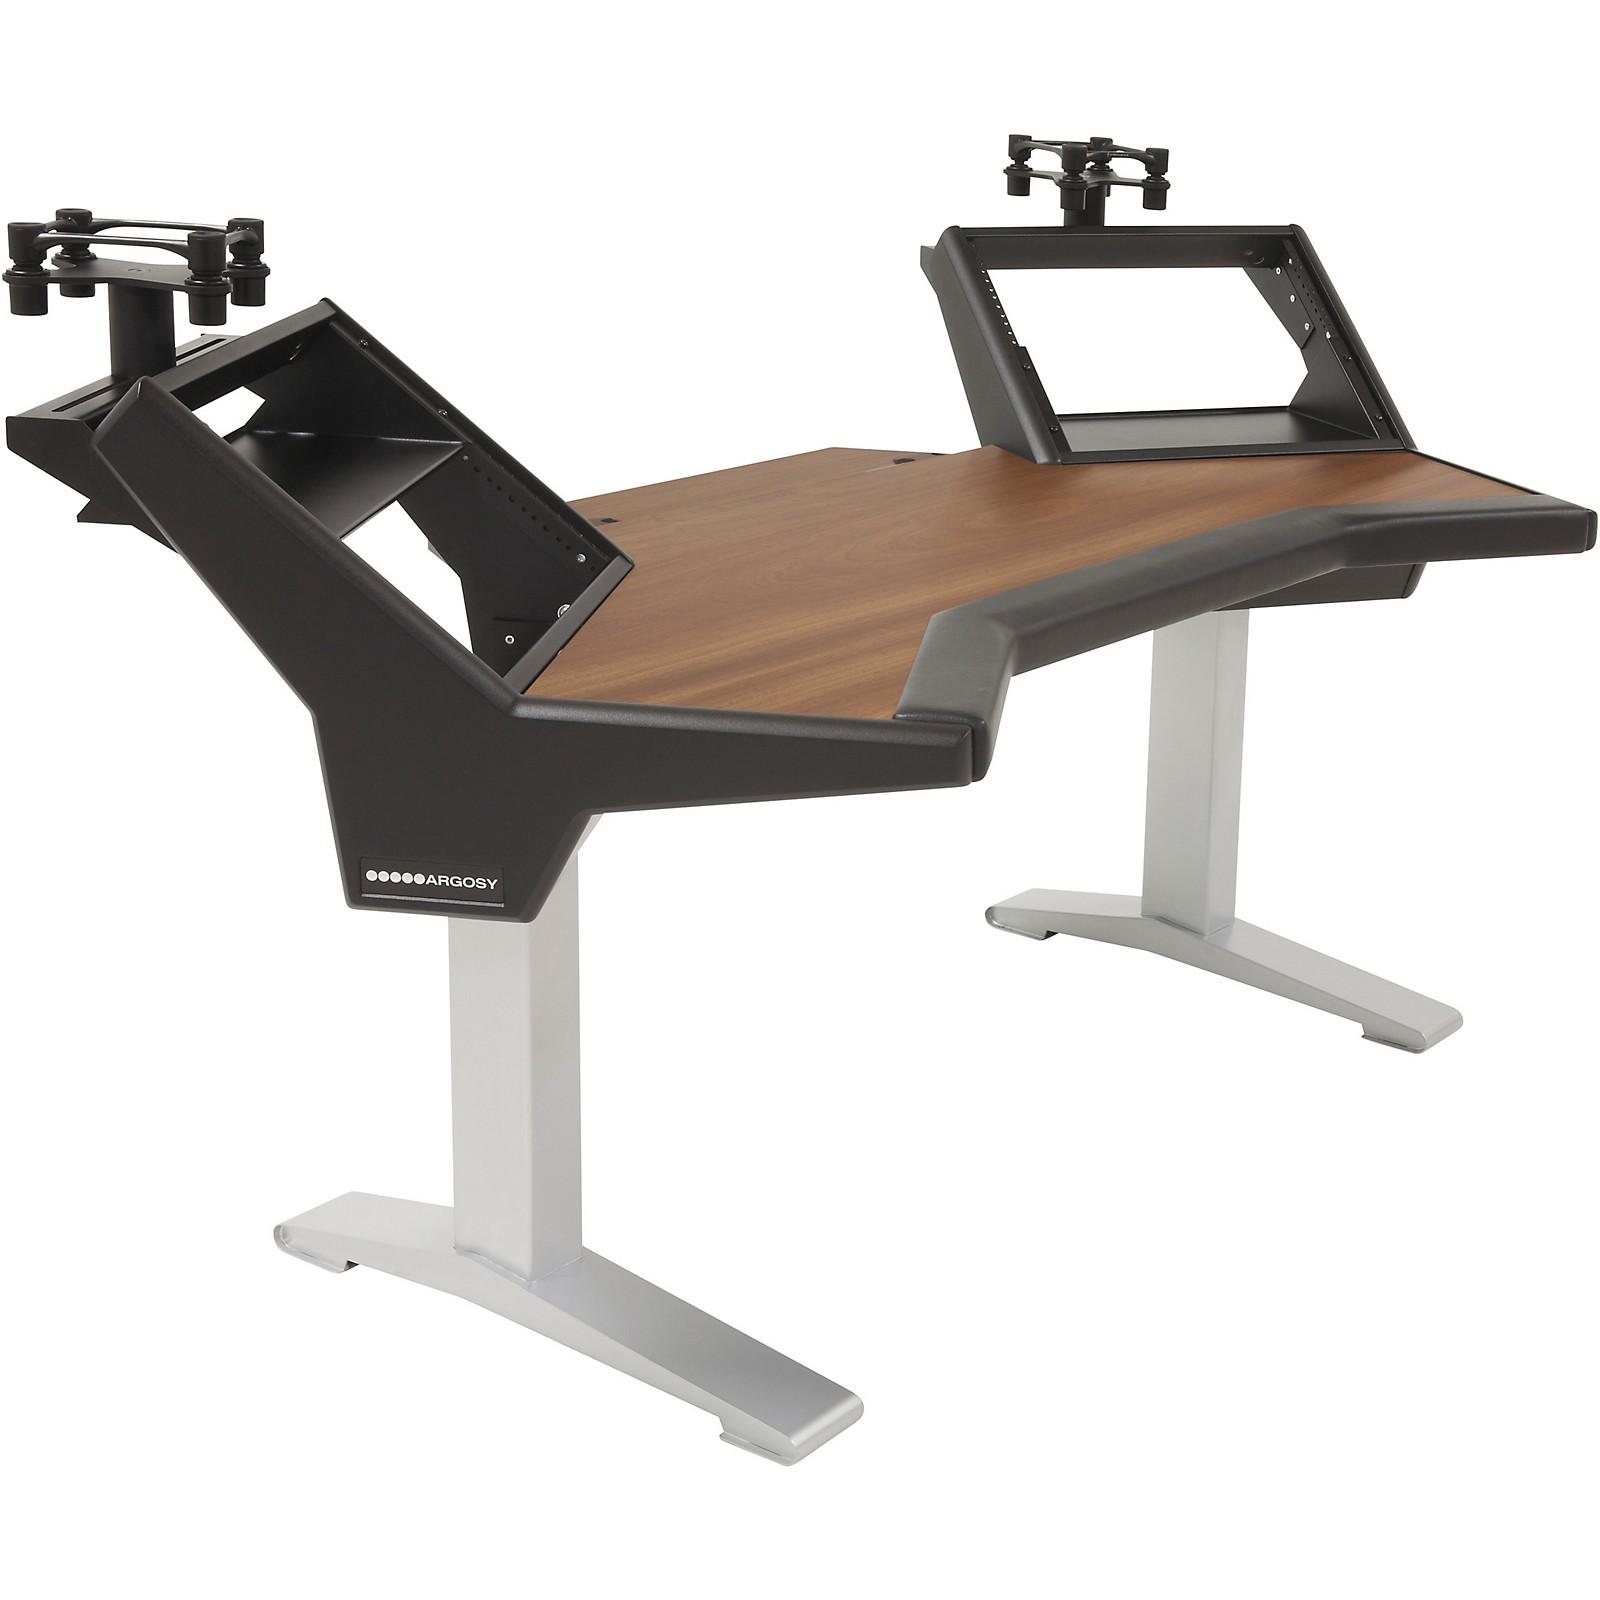 Argosy Halo Plus Desk with Mahogany Surface